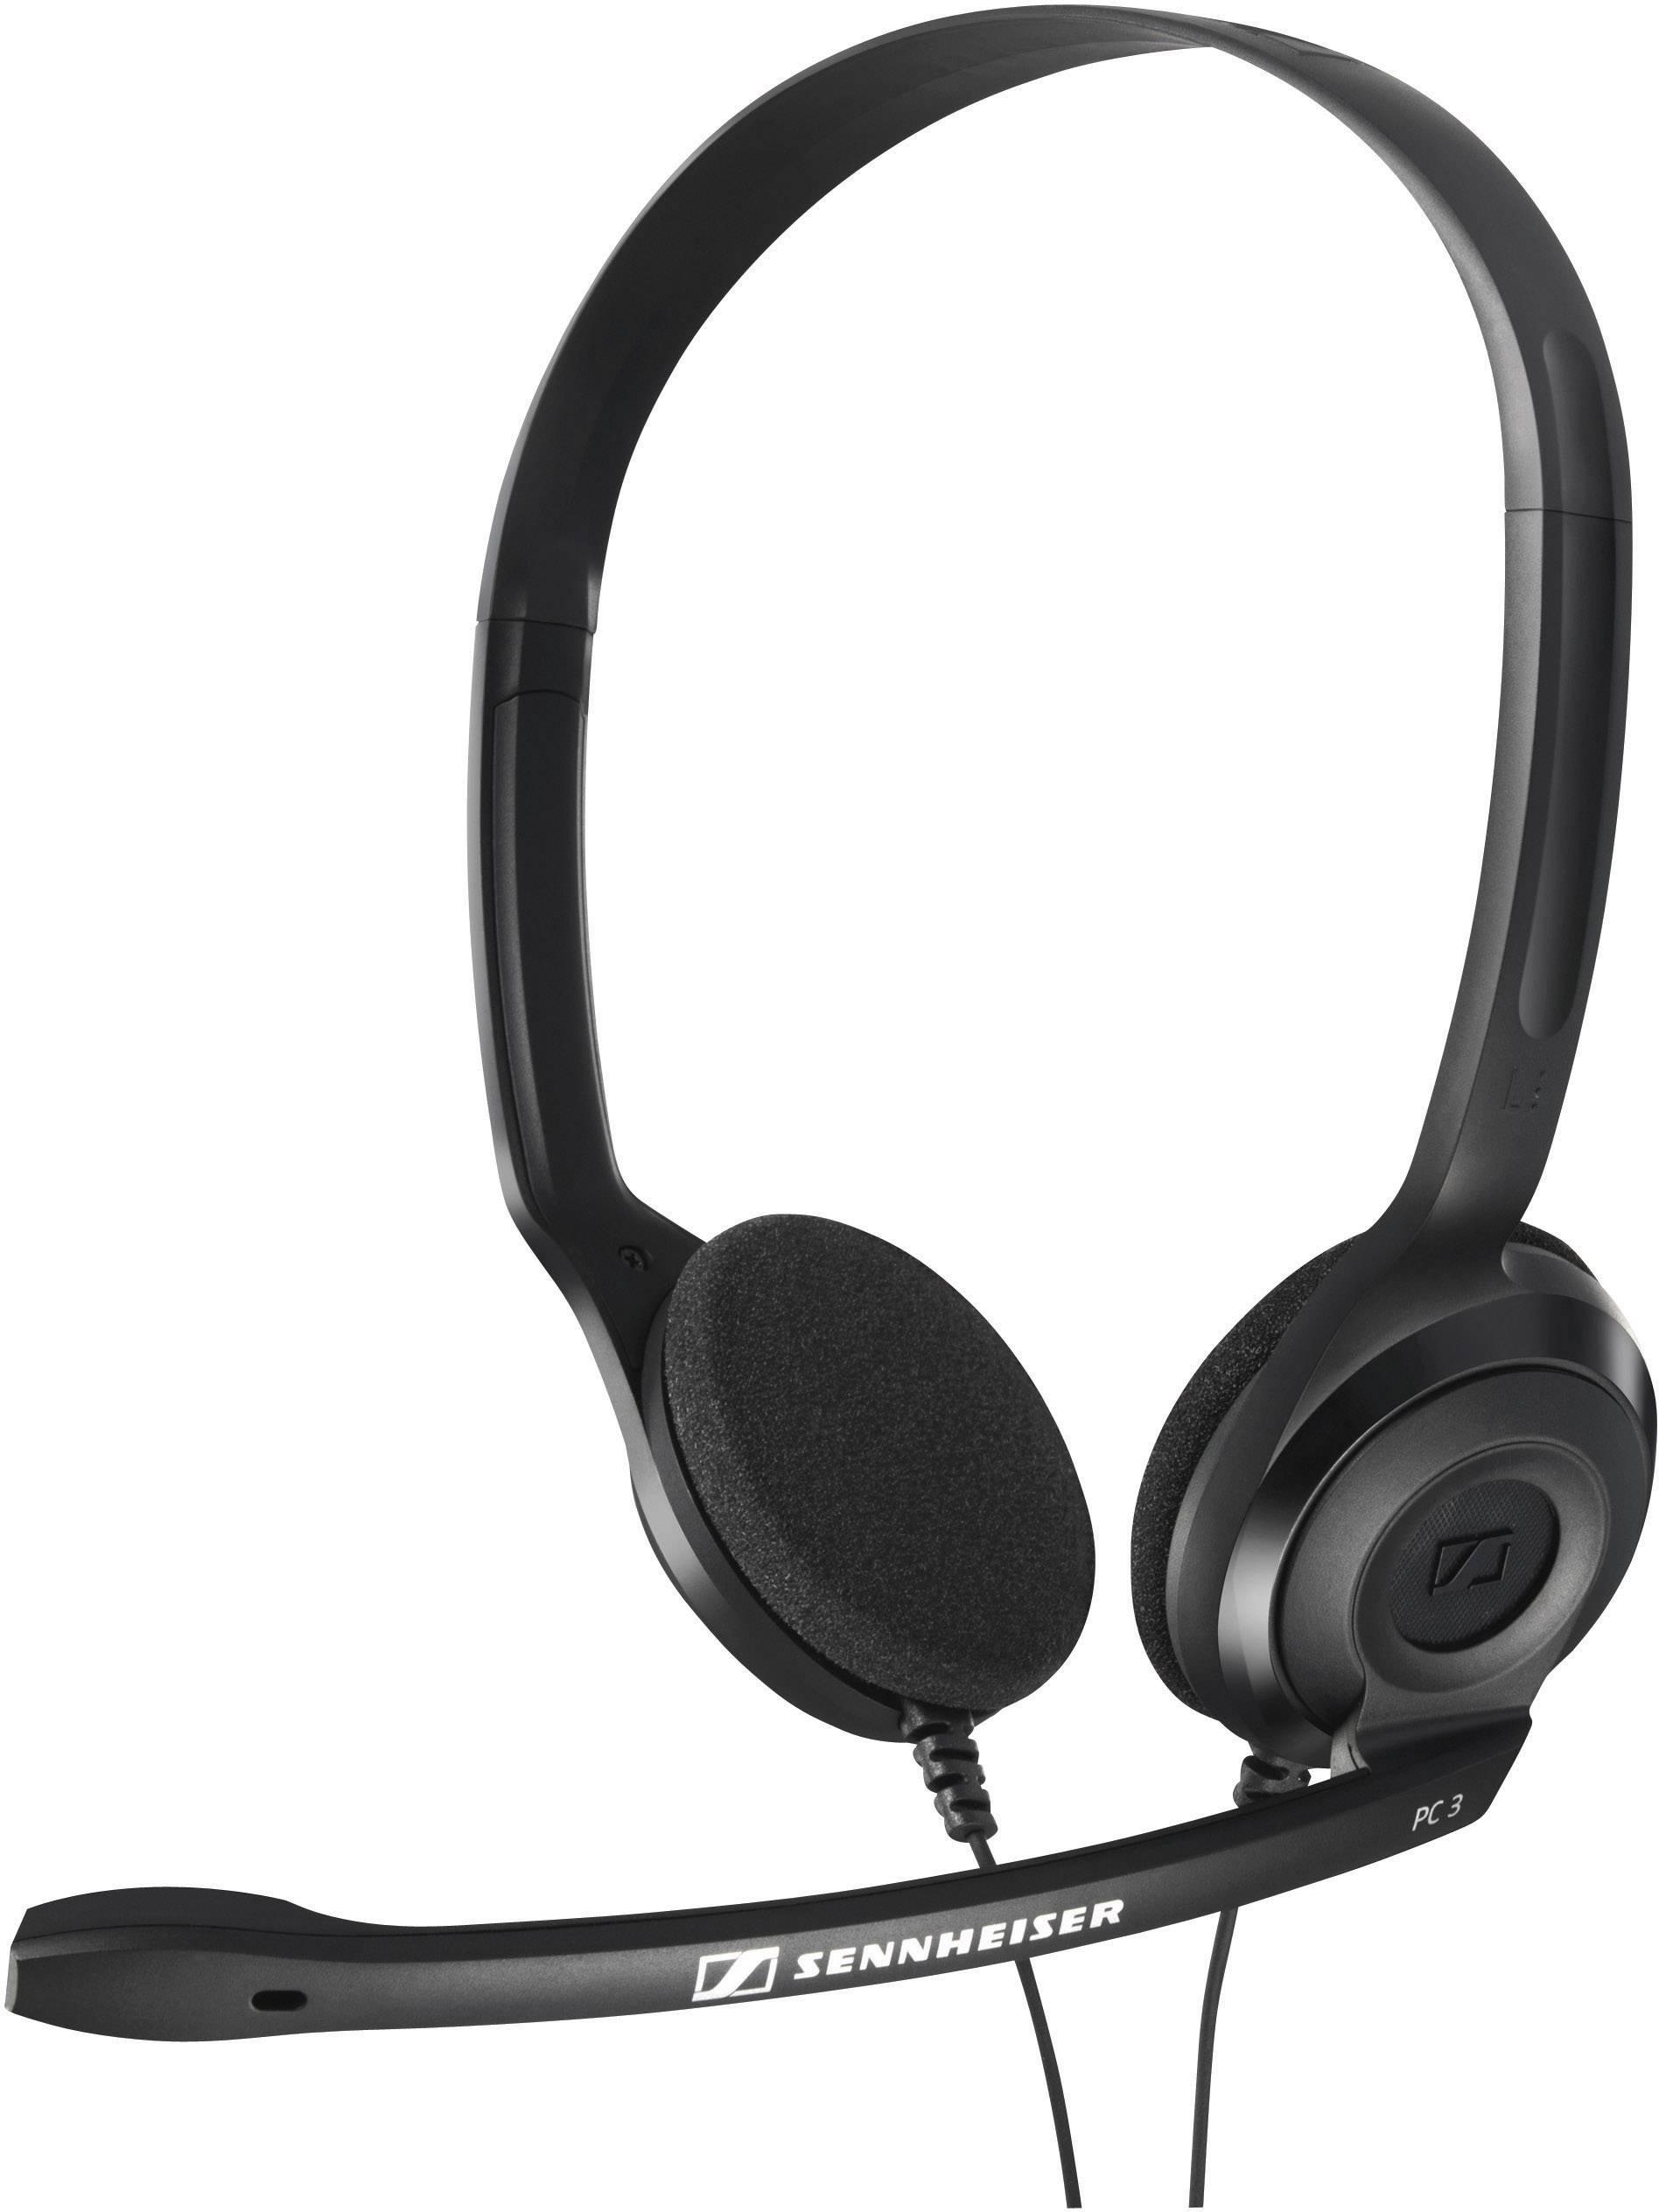 PC-headset On-ear Sennheiser PC 3 Chat 3 dcdf028e1e283